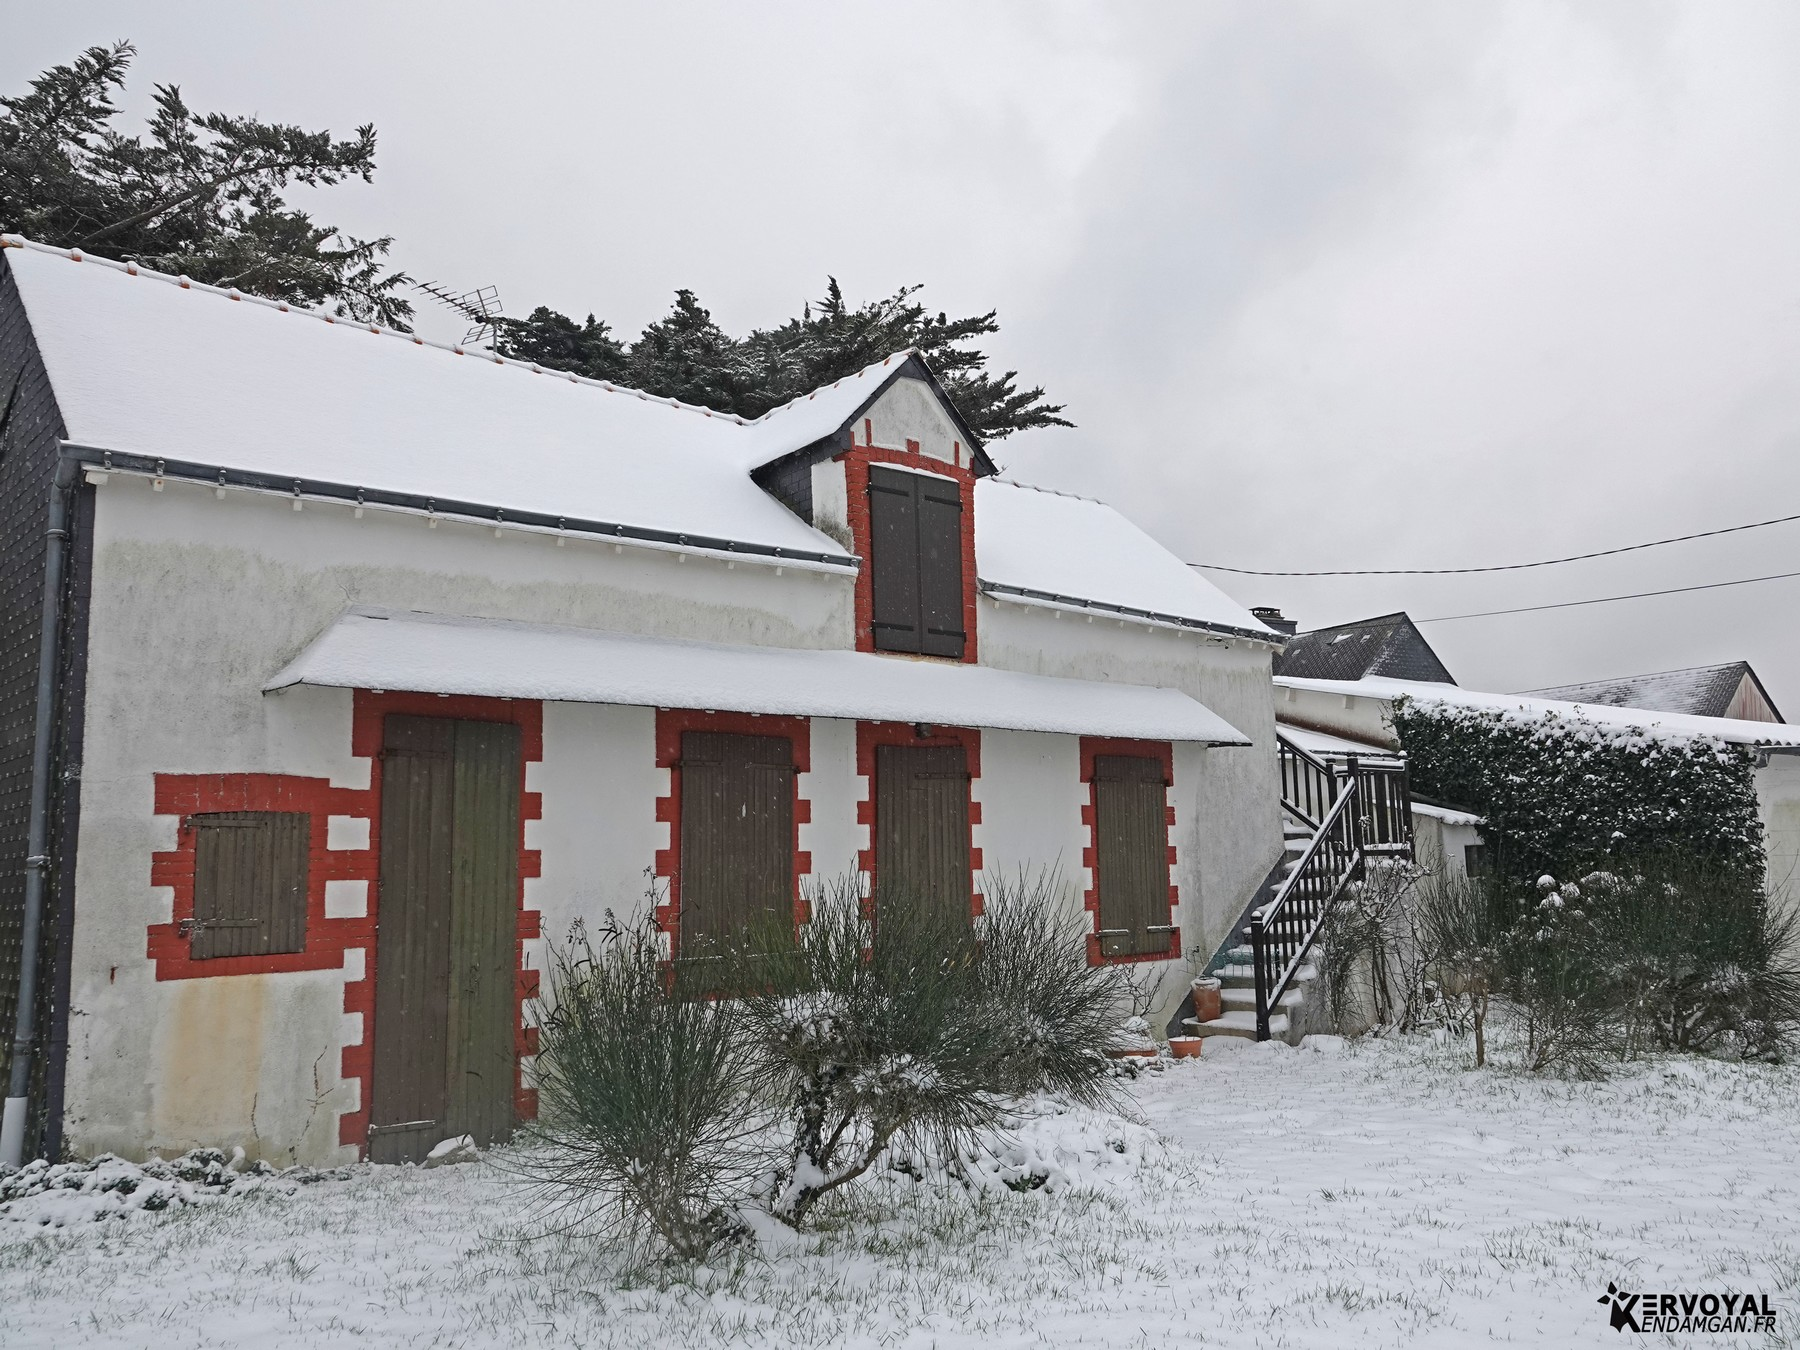 neige à kervoyal 11 février 2021 damgan morbihan (11)